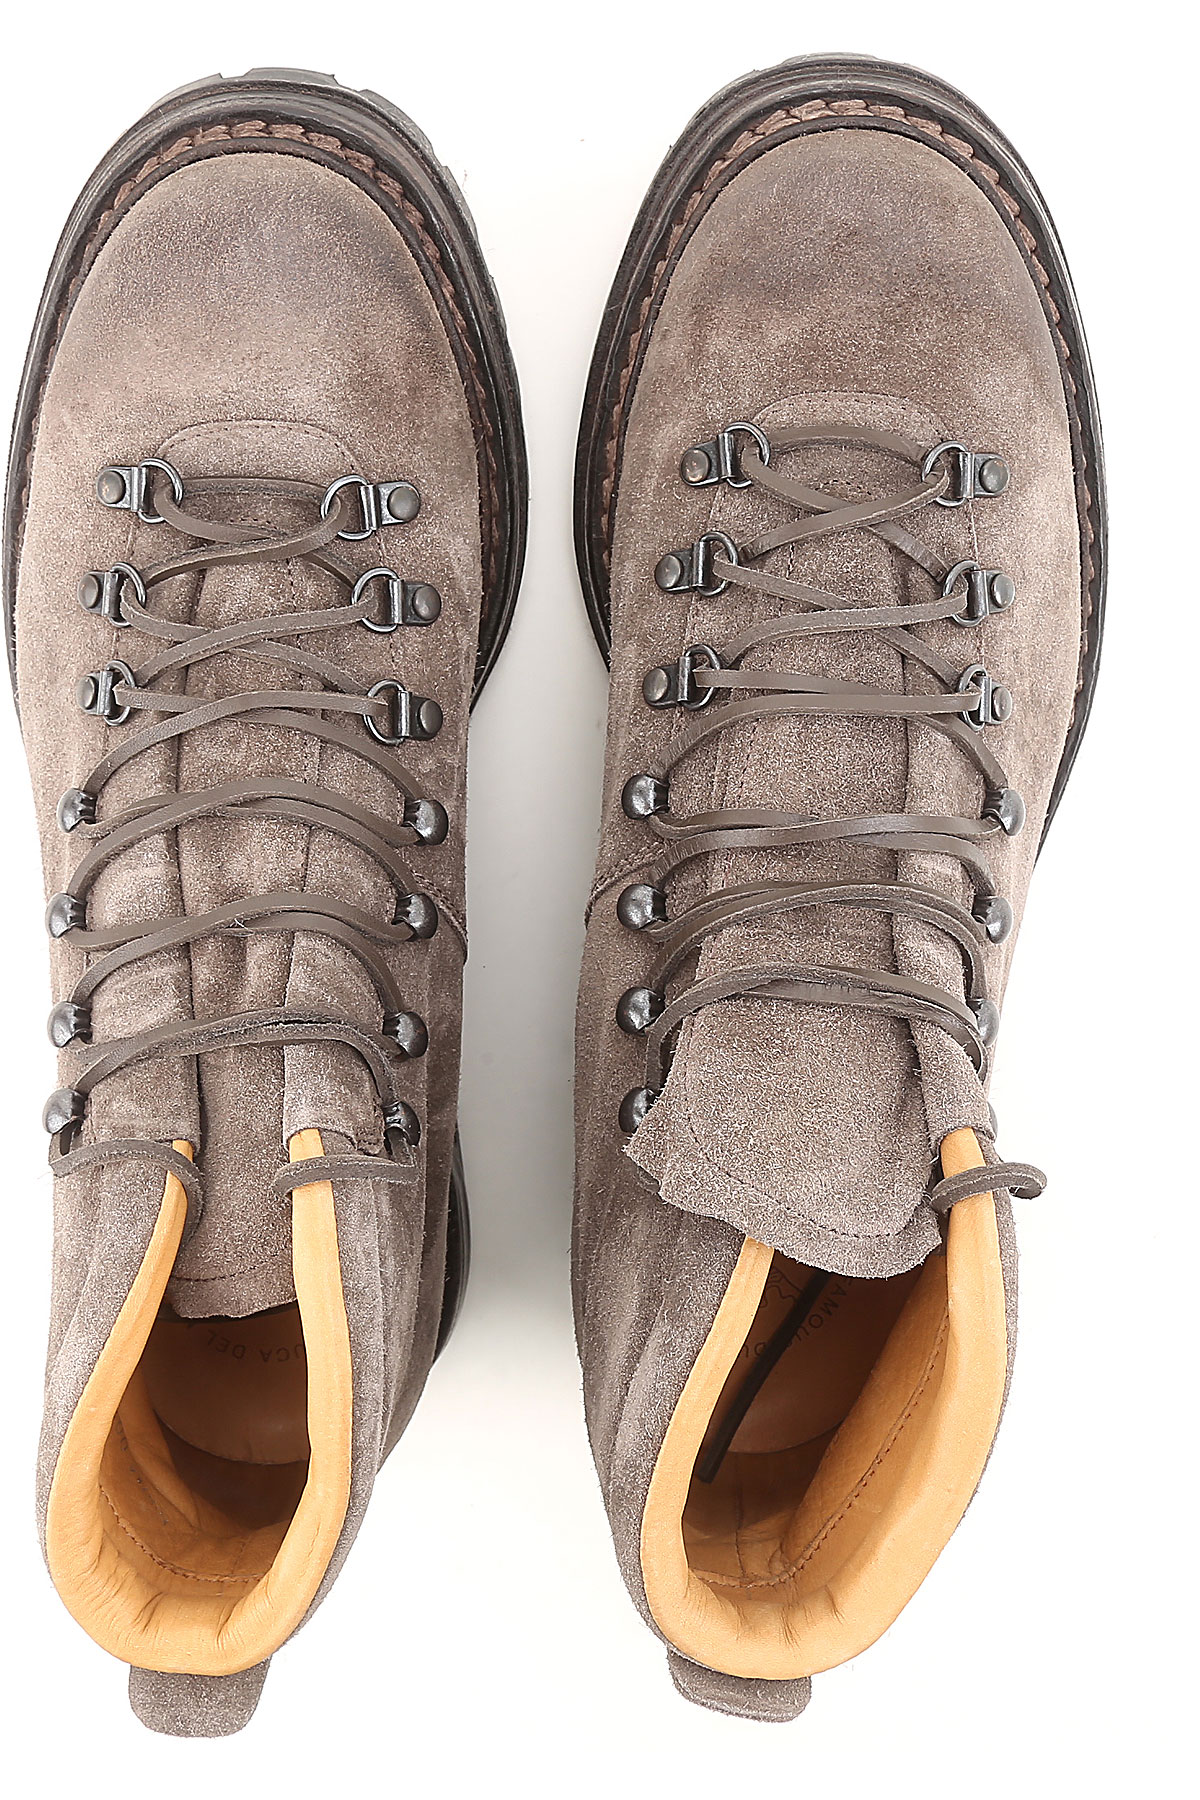 Creative verano Para Hombres Zapatos Officine Primavera 2019 nbsp; Gris gdpqX